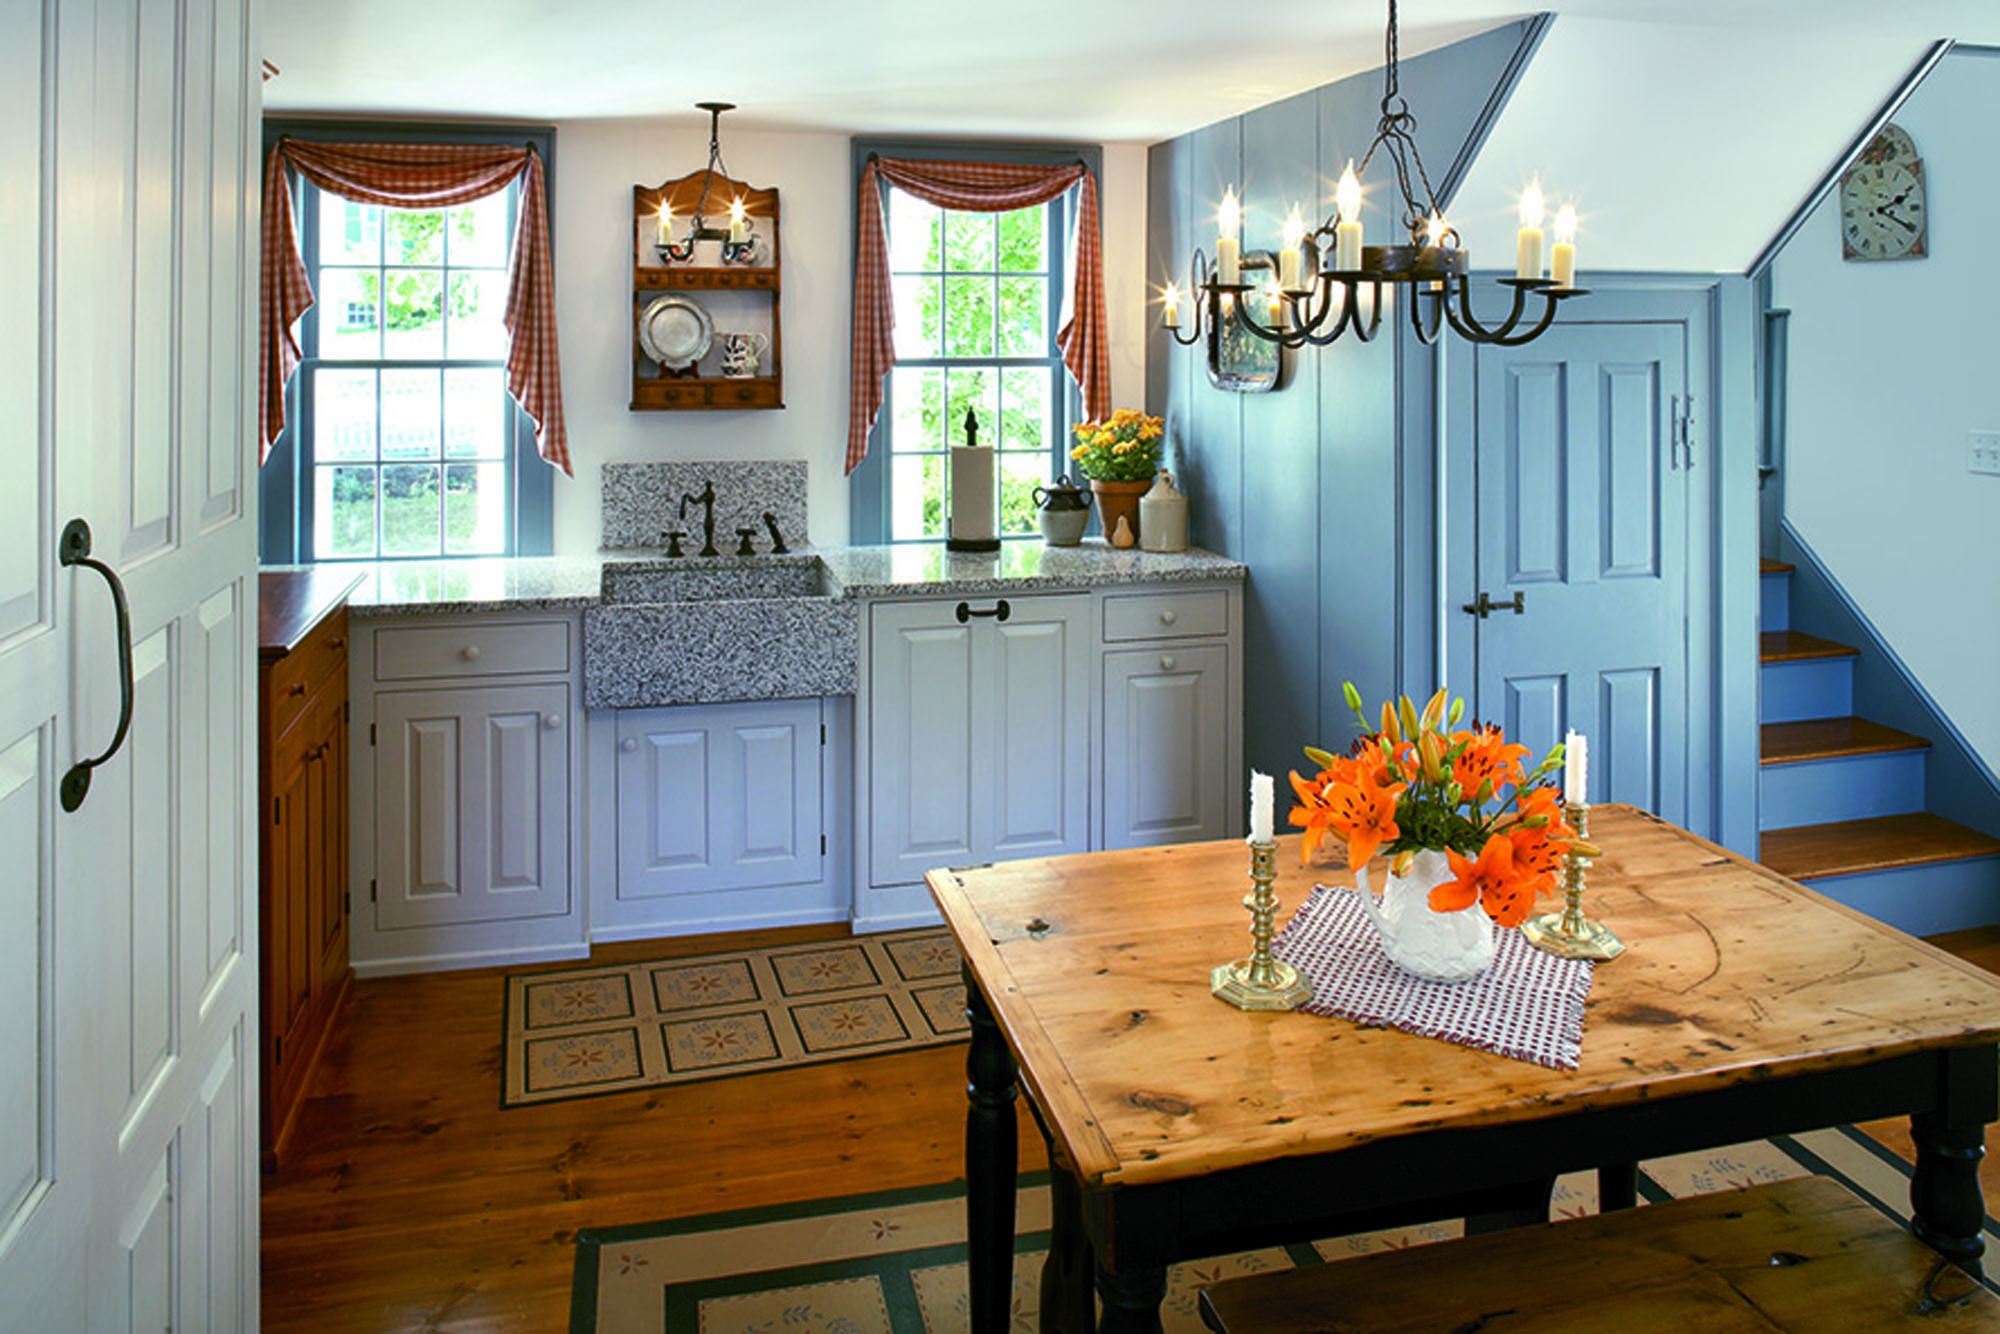 Modest Kitchen for a Circa 1800 House